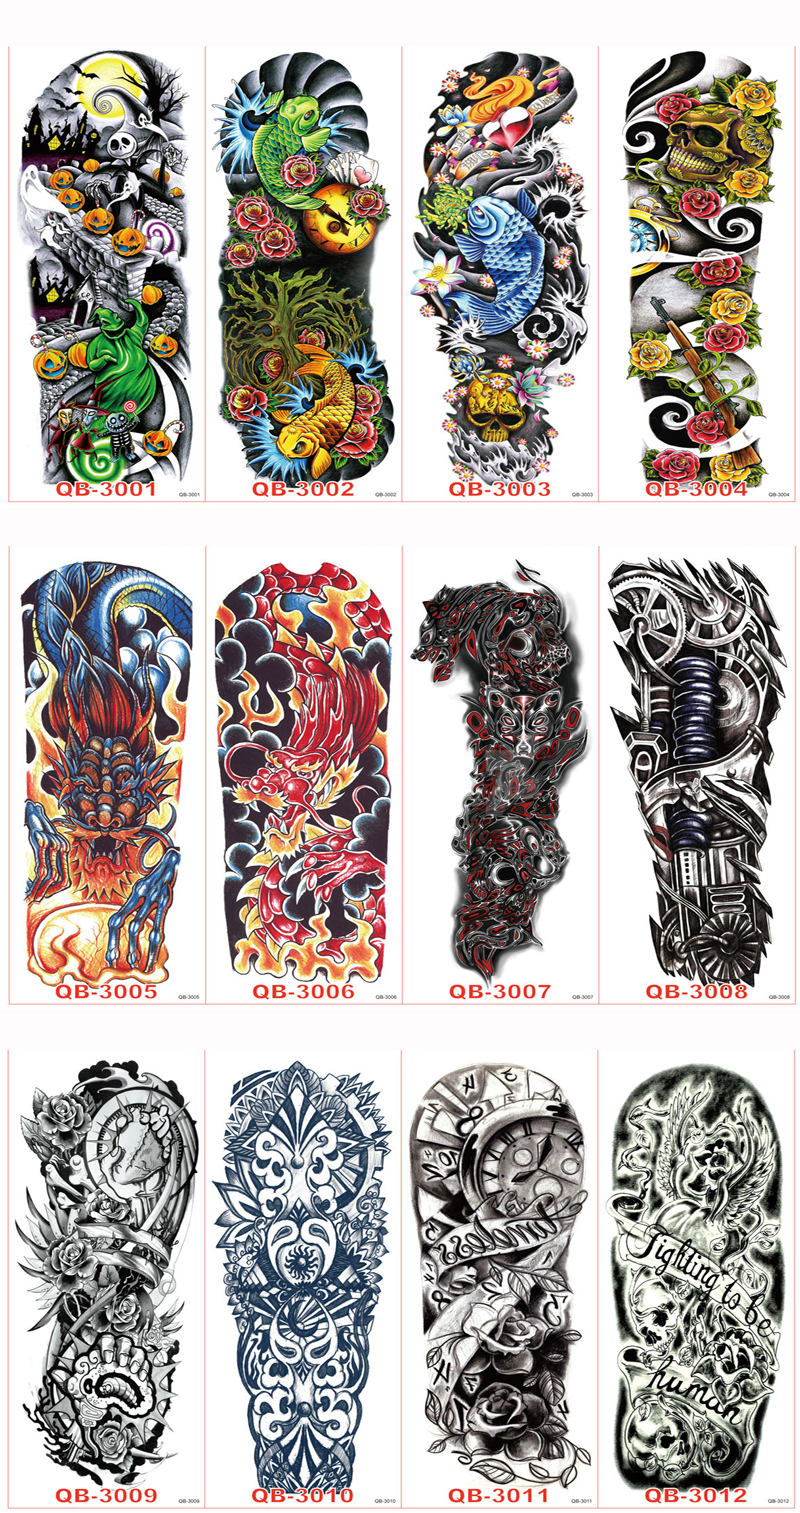 Pcs Waterproof Large Temporary Tattoos Stickers Fake Paste Leg Full Arm Tattoo Sticker Sleeve On The Body Art For Men Women 17